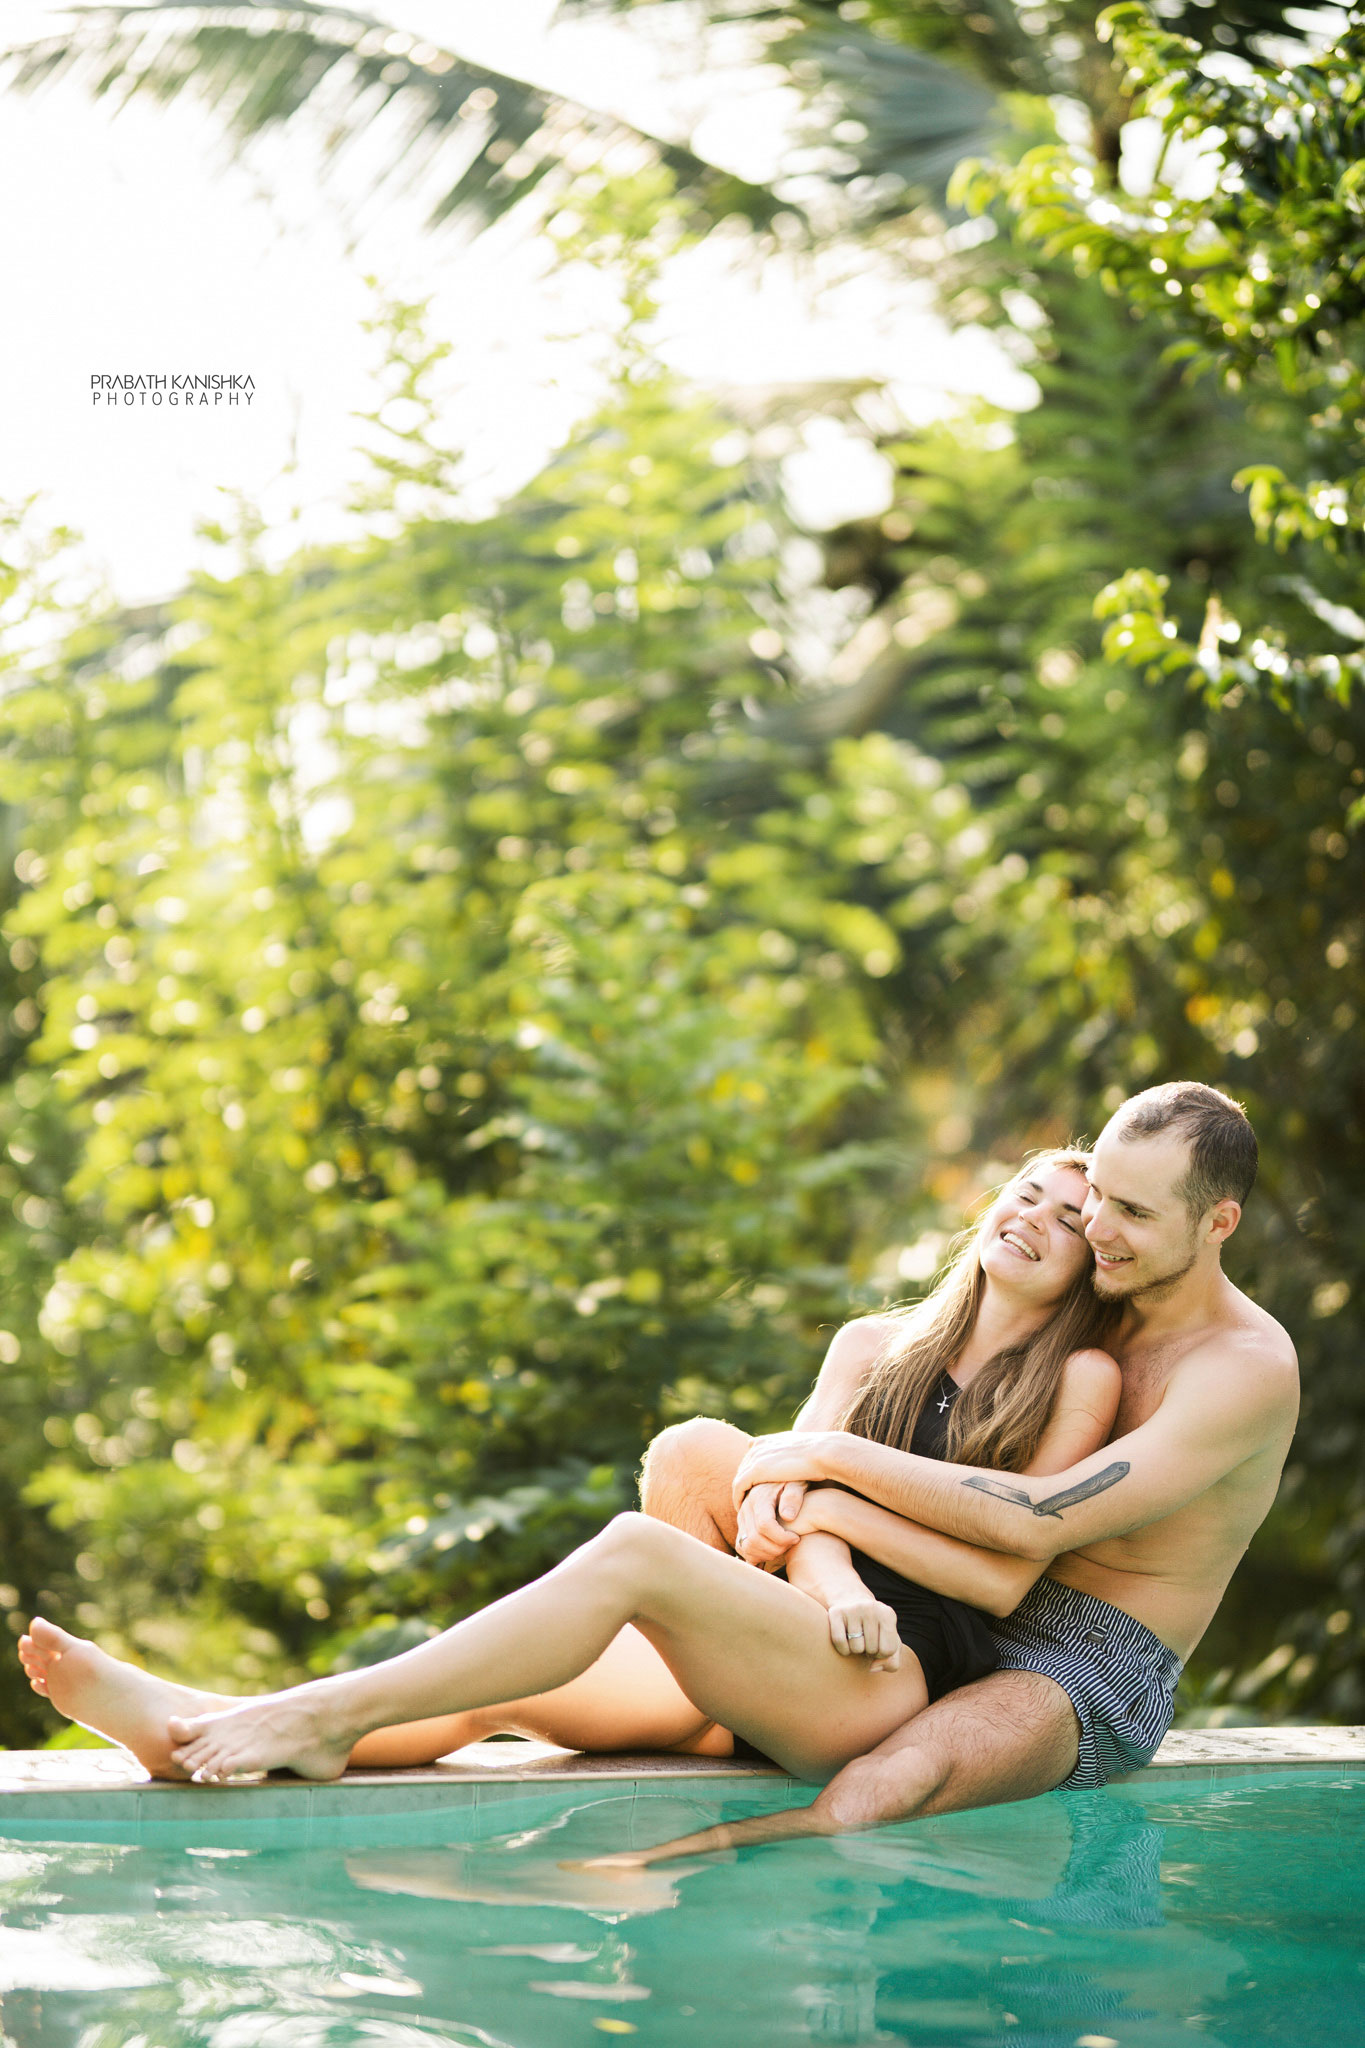 Ally & Casey - Prabath Kanishka Photography